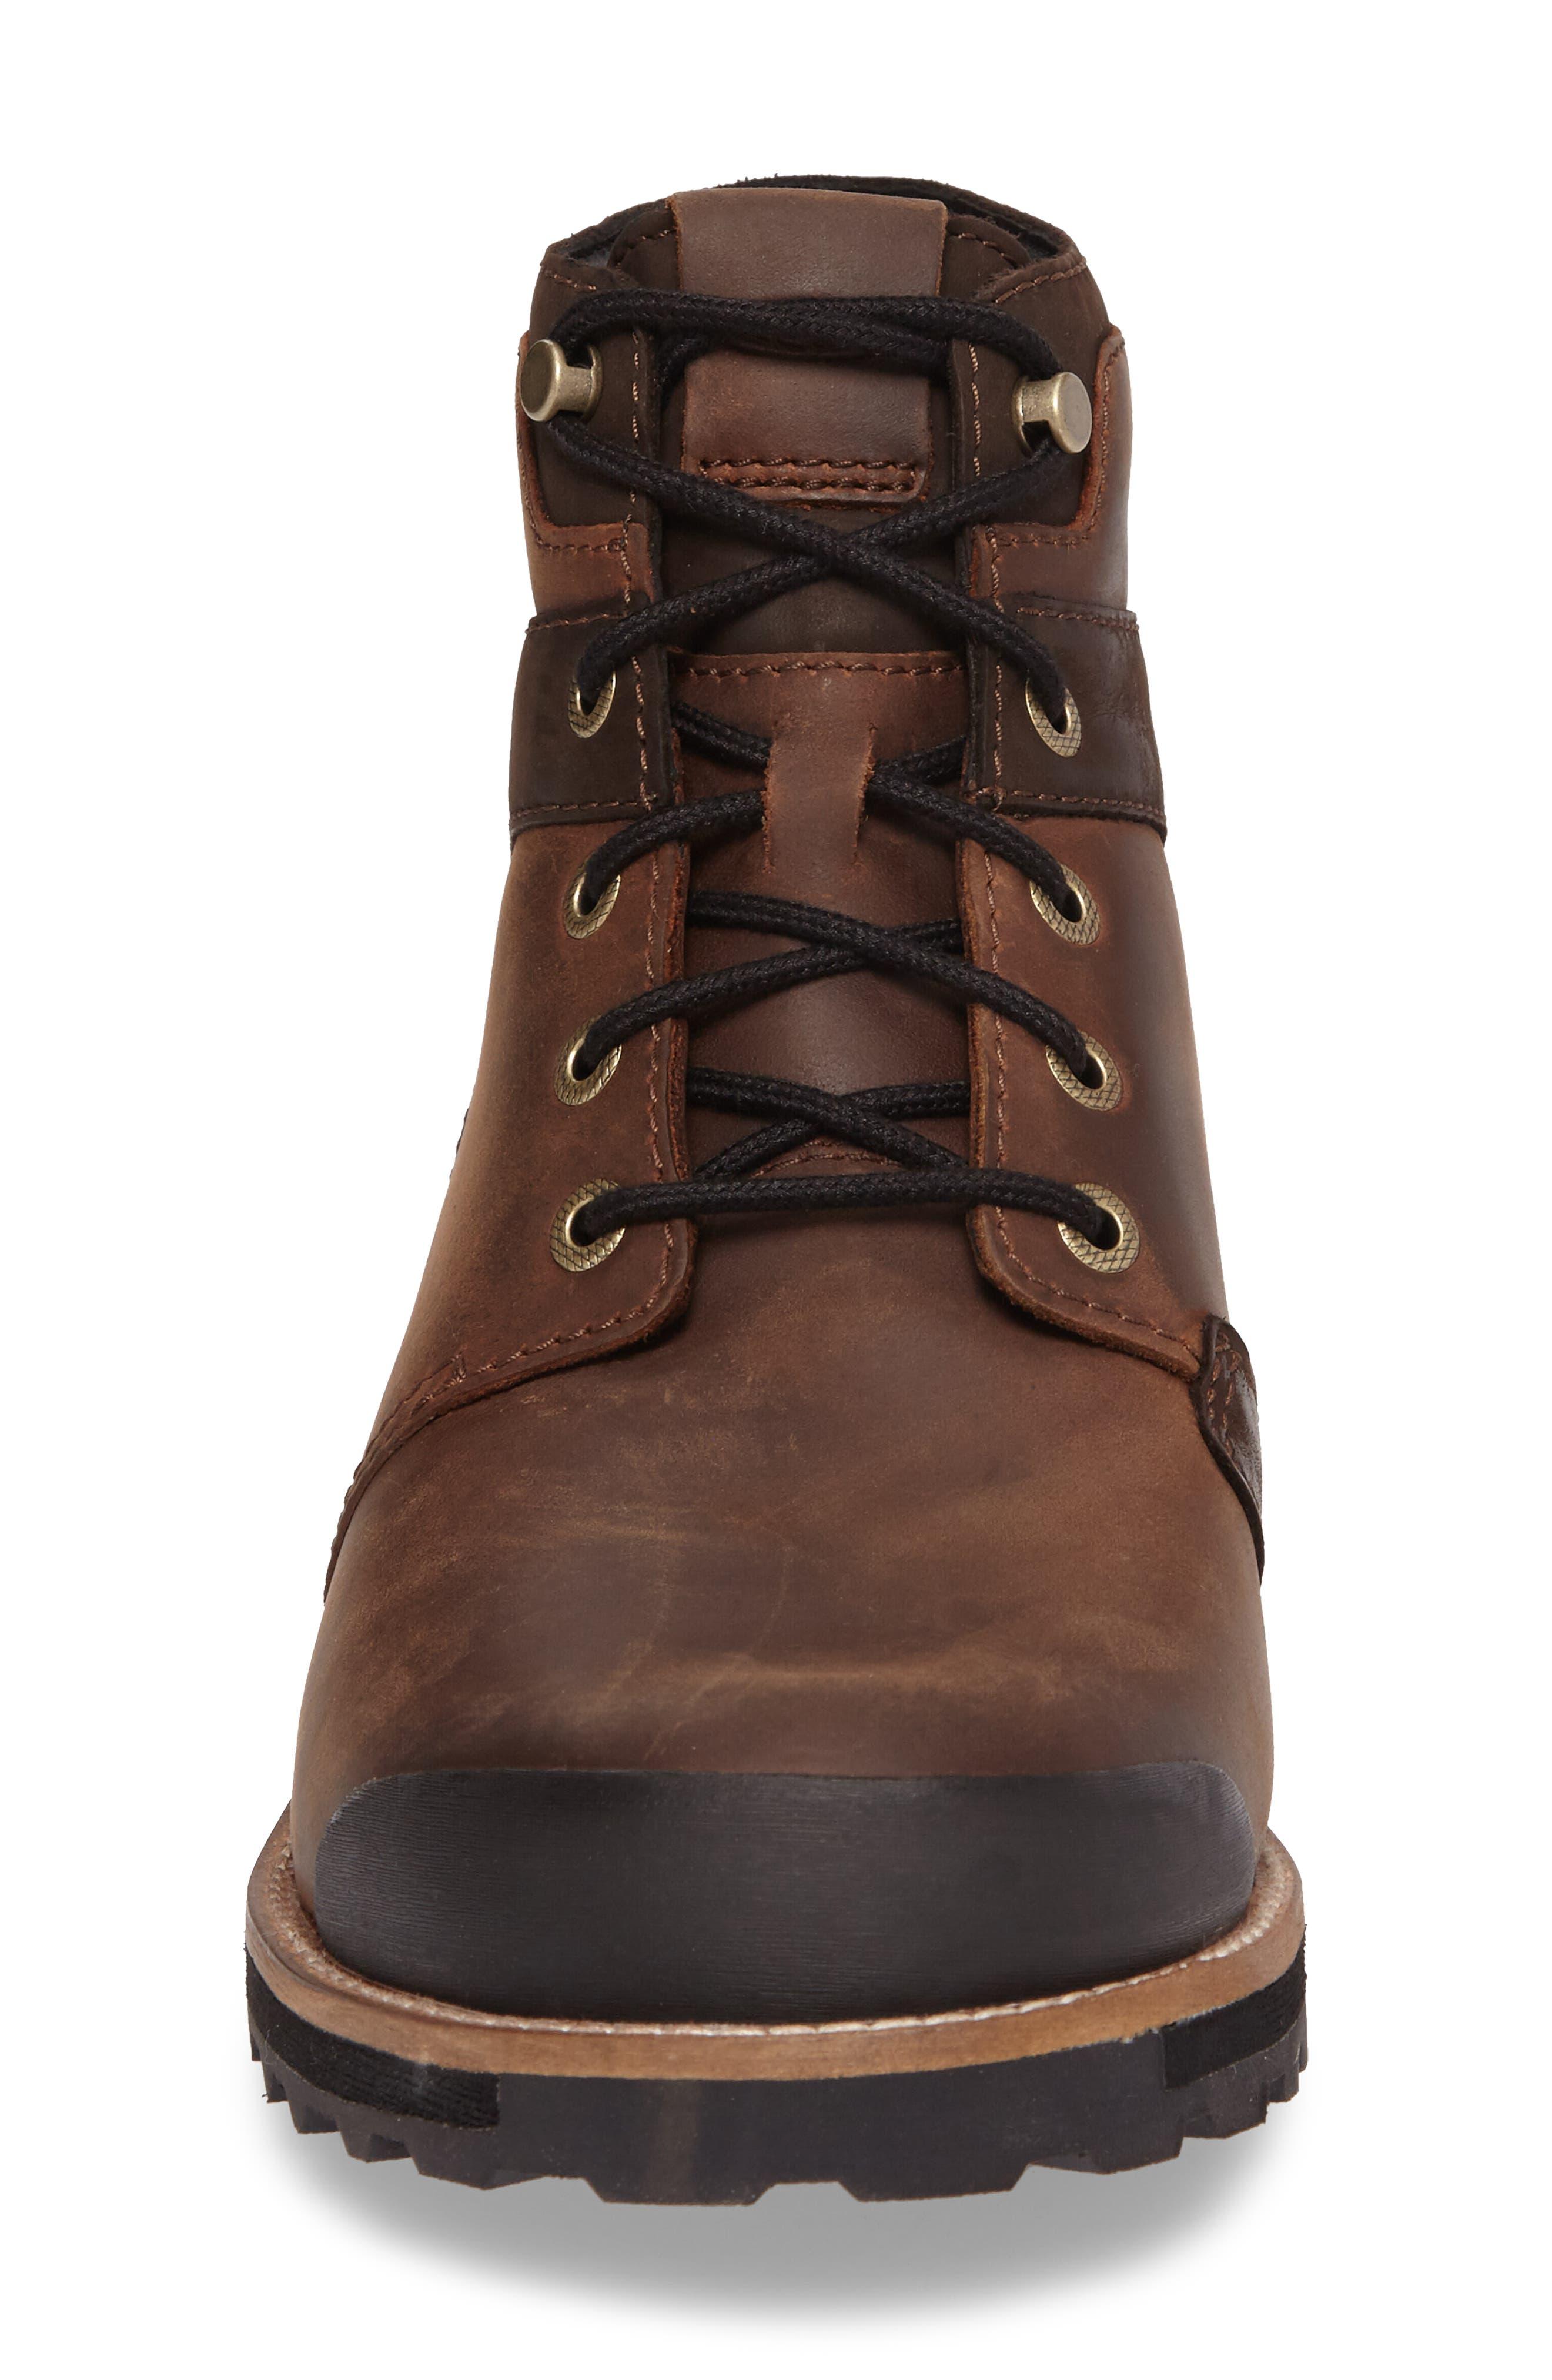 KEEN, The Rocker Waterproof Plain Toe Boot, Alternate thumbnail 4, color, BIG BEN/ EIFFEL